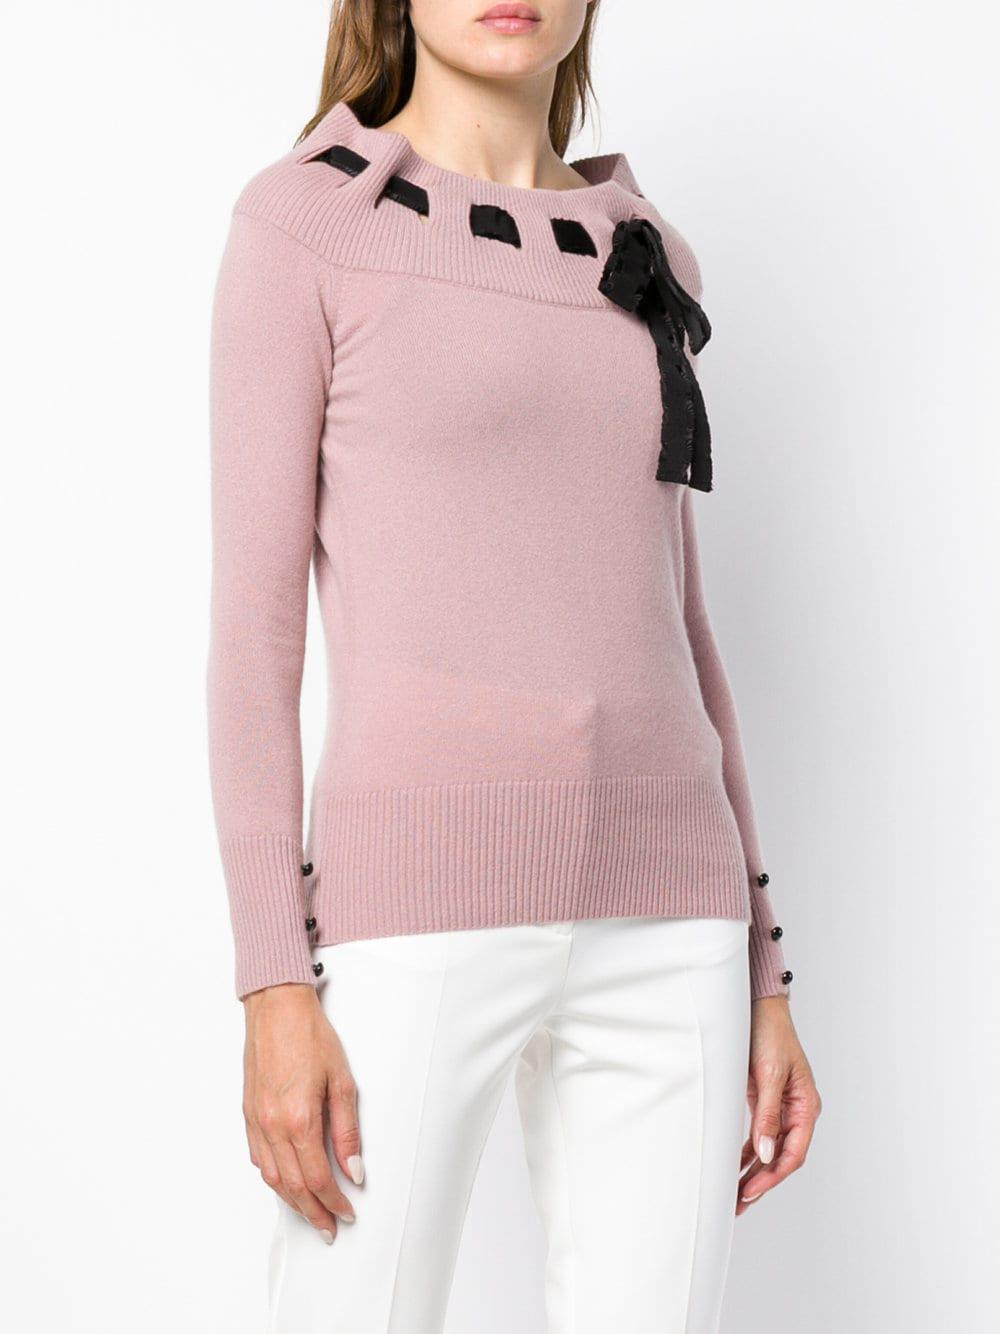 Blumarine Cashmere Bow Detail Sweater in Pink